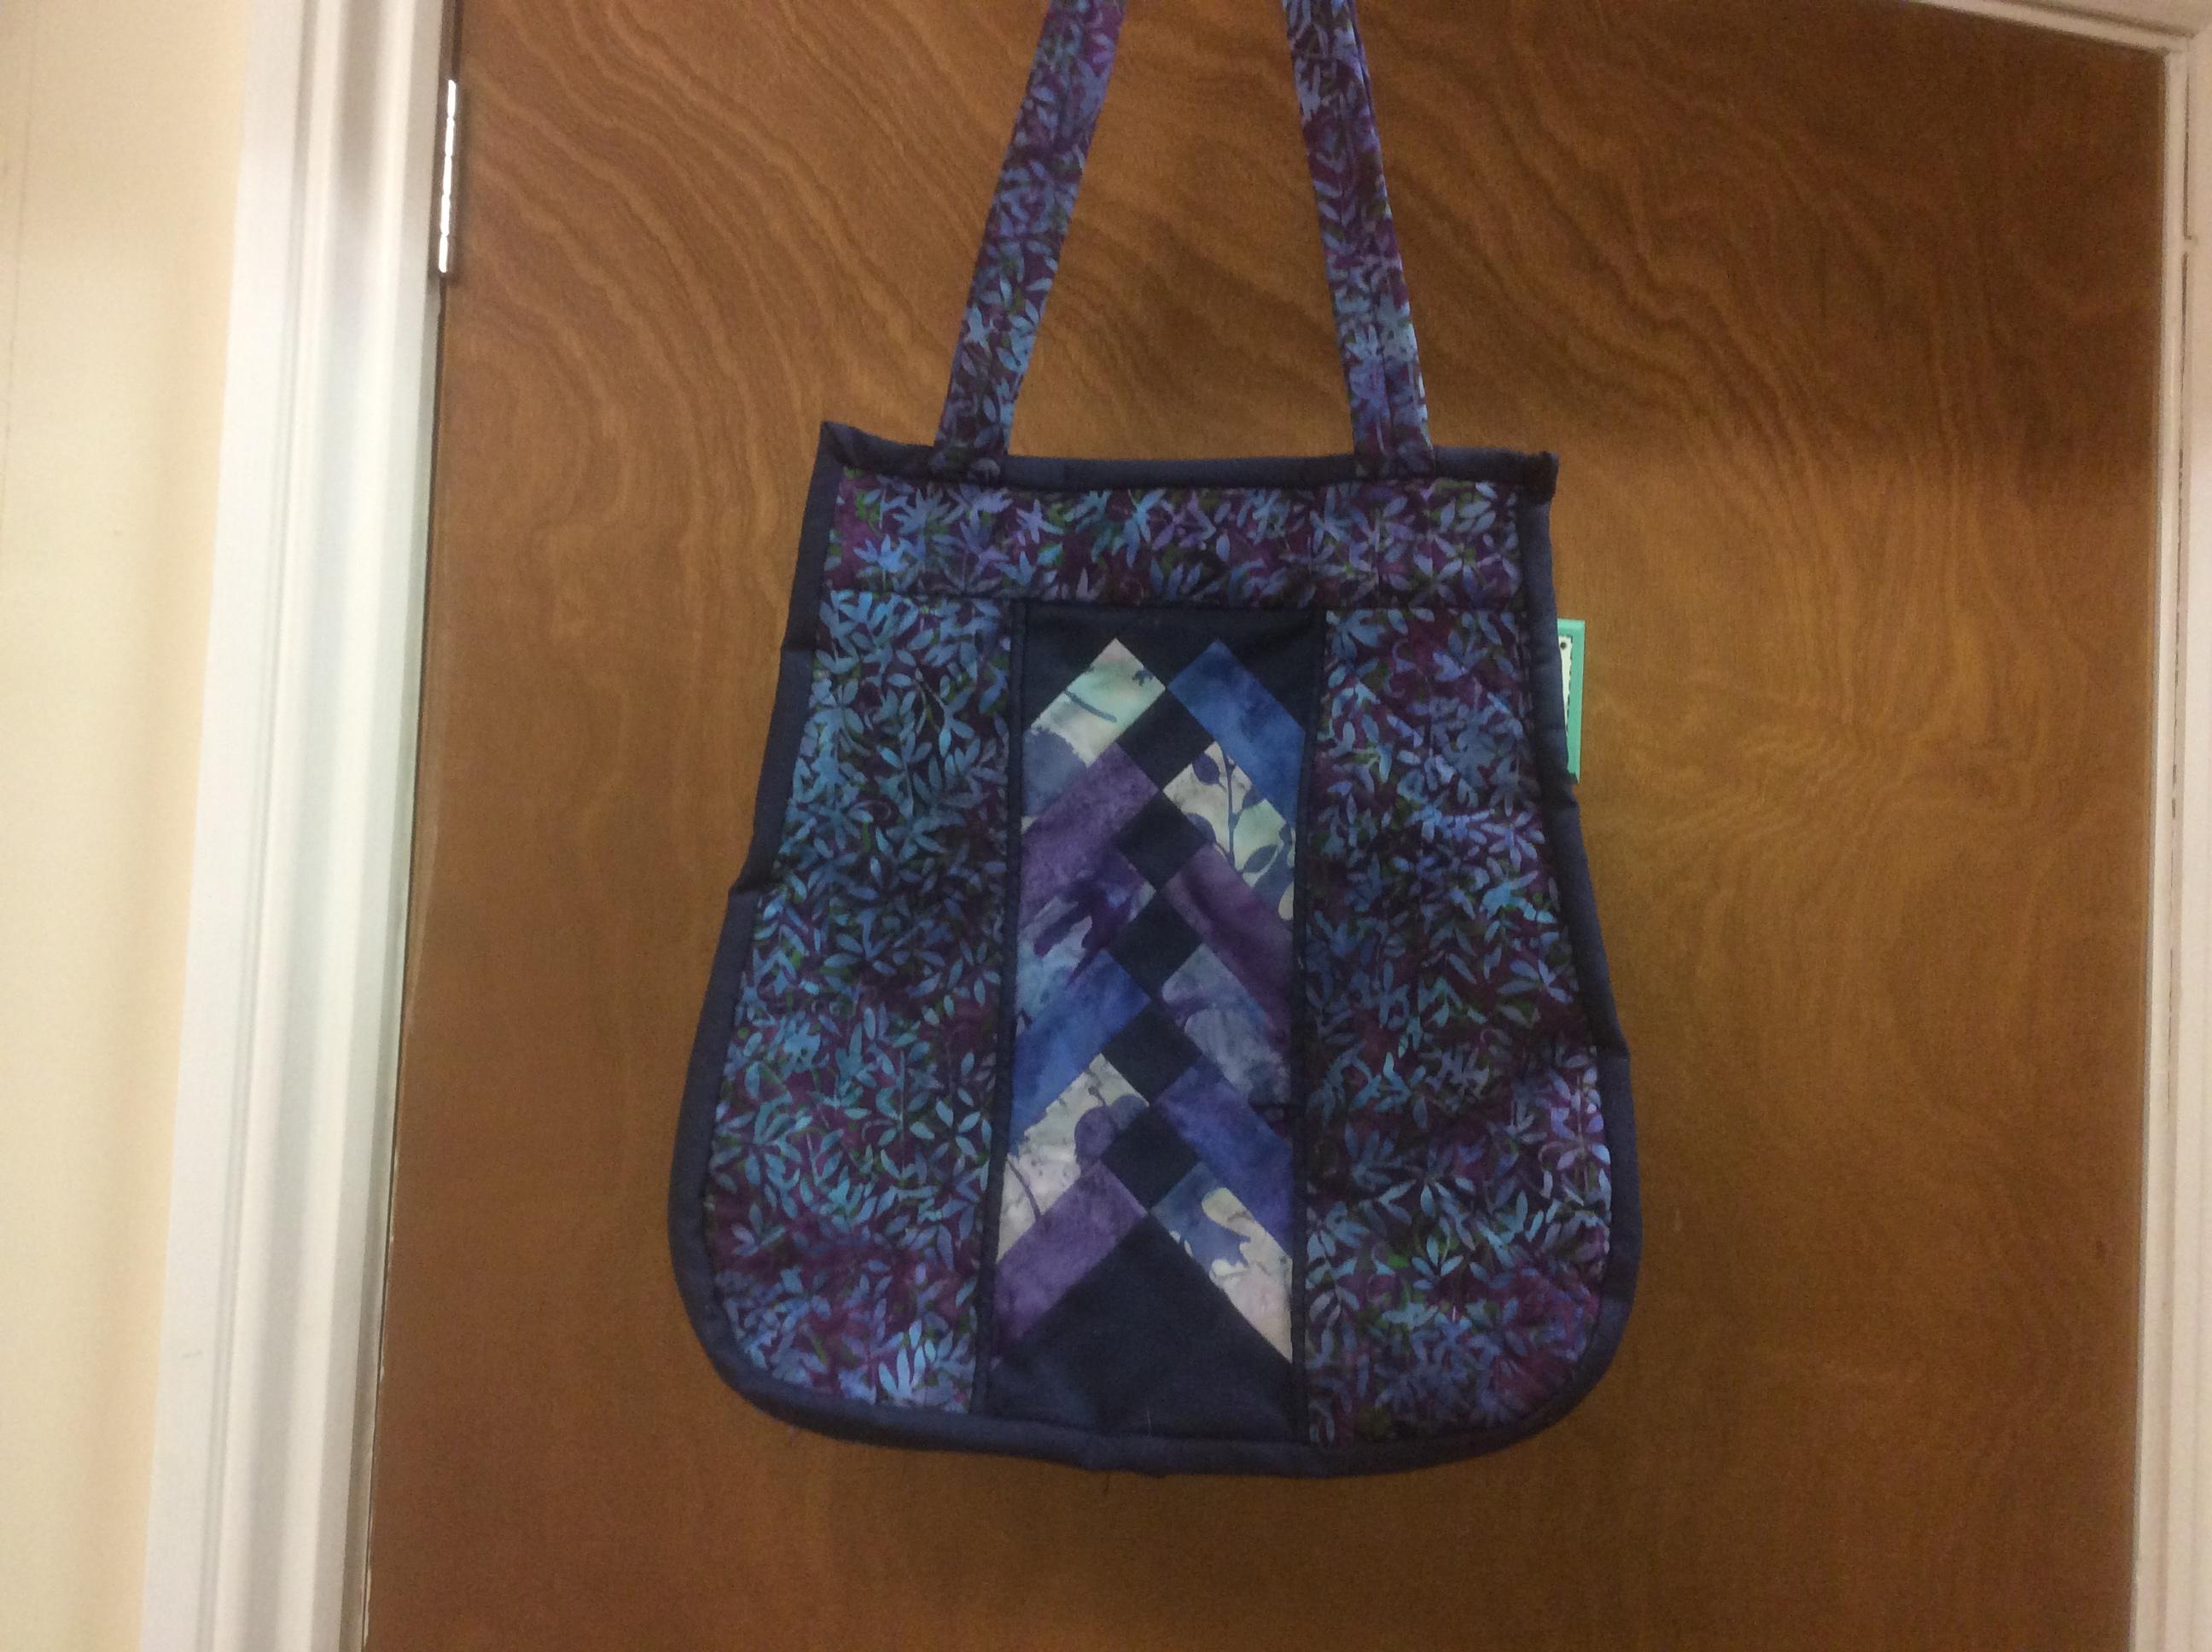 Anita's bag made in workshop